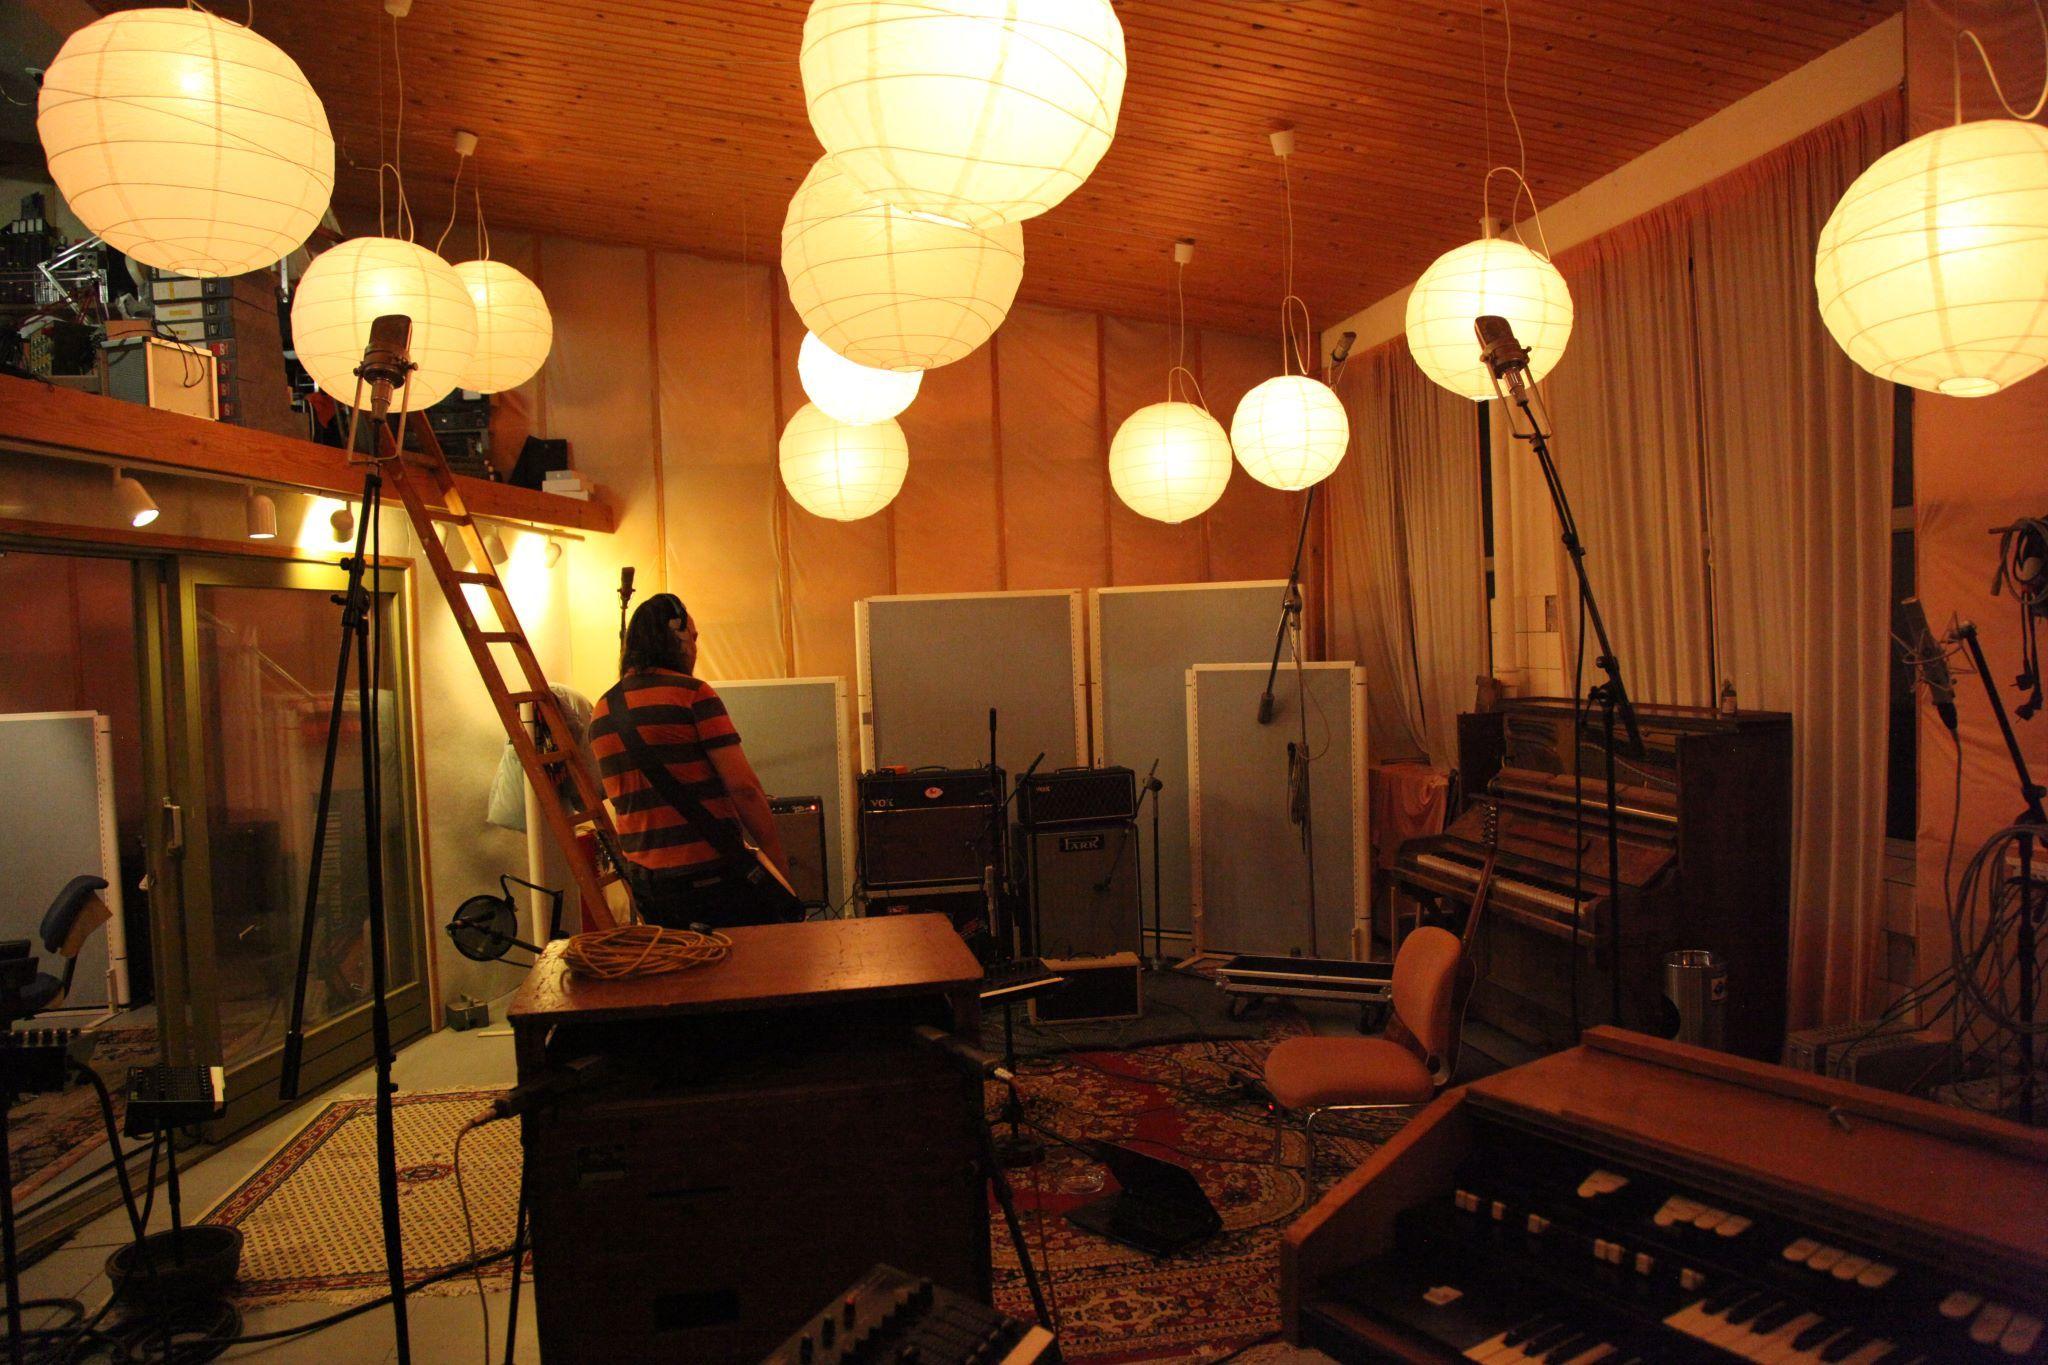 321884 10150305935402435 723662434 7832319 170001455 O Jpg 2048 1365 Home Studio Music Music Studio Studio Setup